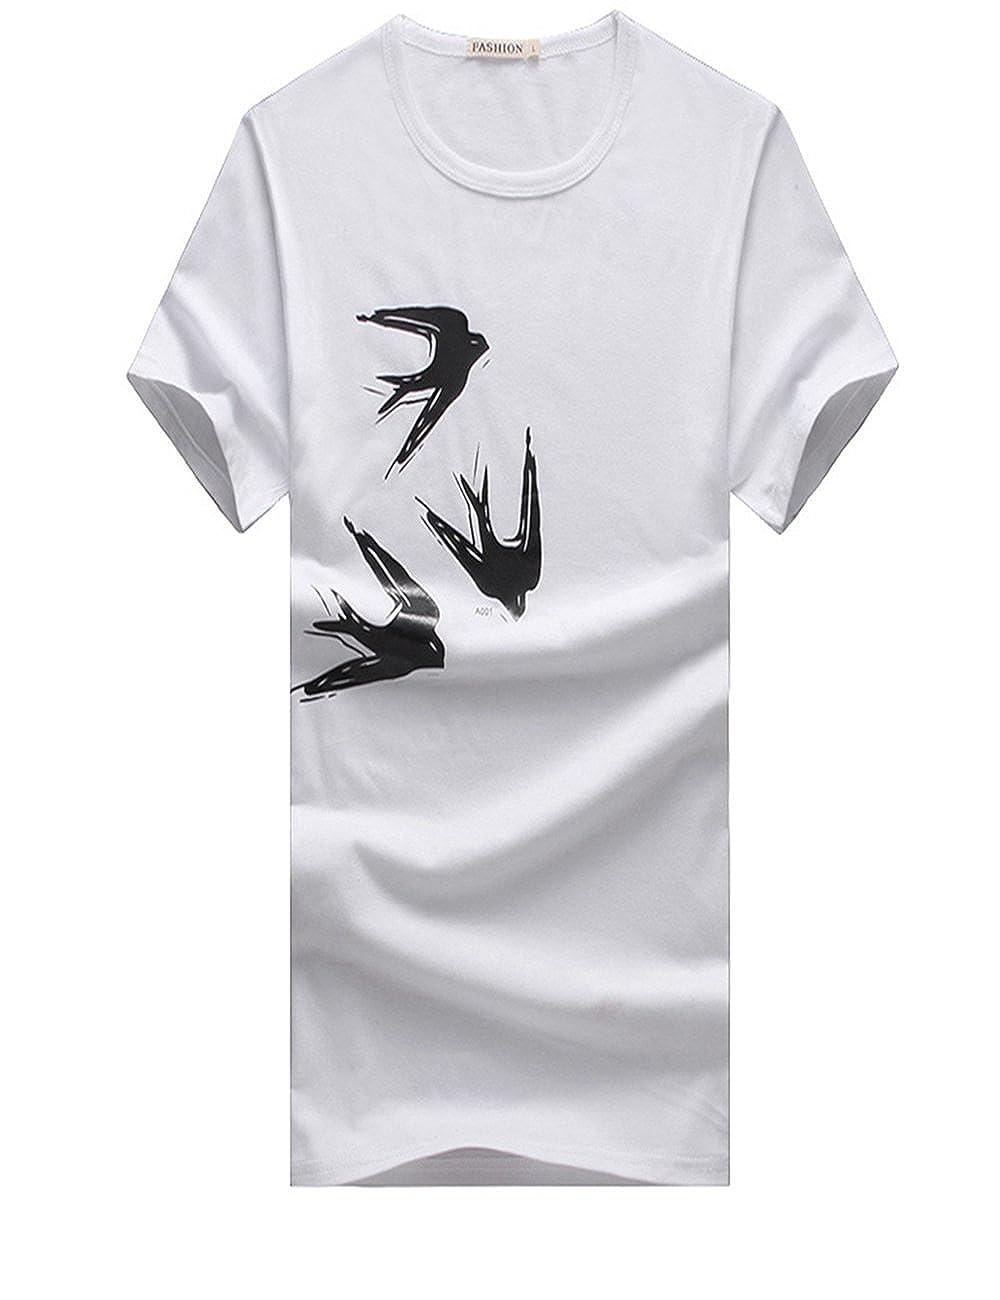 e668b50af4 Menschwear Mens T-Shirt Short Sleeve Shirts (XXXL,White): Amazon.co.uk:  Clothing